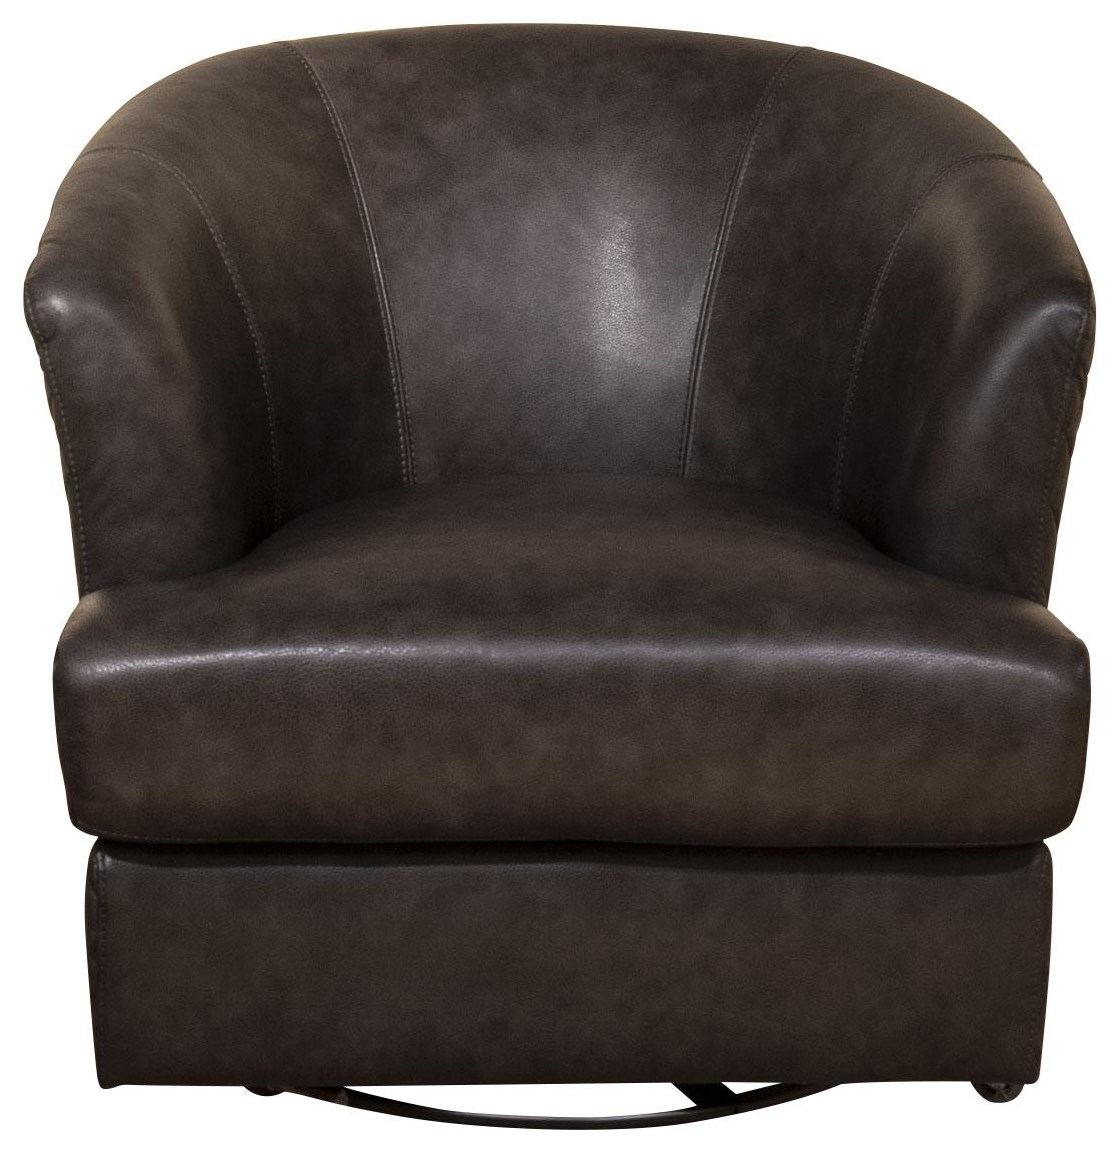 Lianna - Lianna Leather Swivel Chair by Abbyson at Morris Home